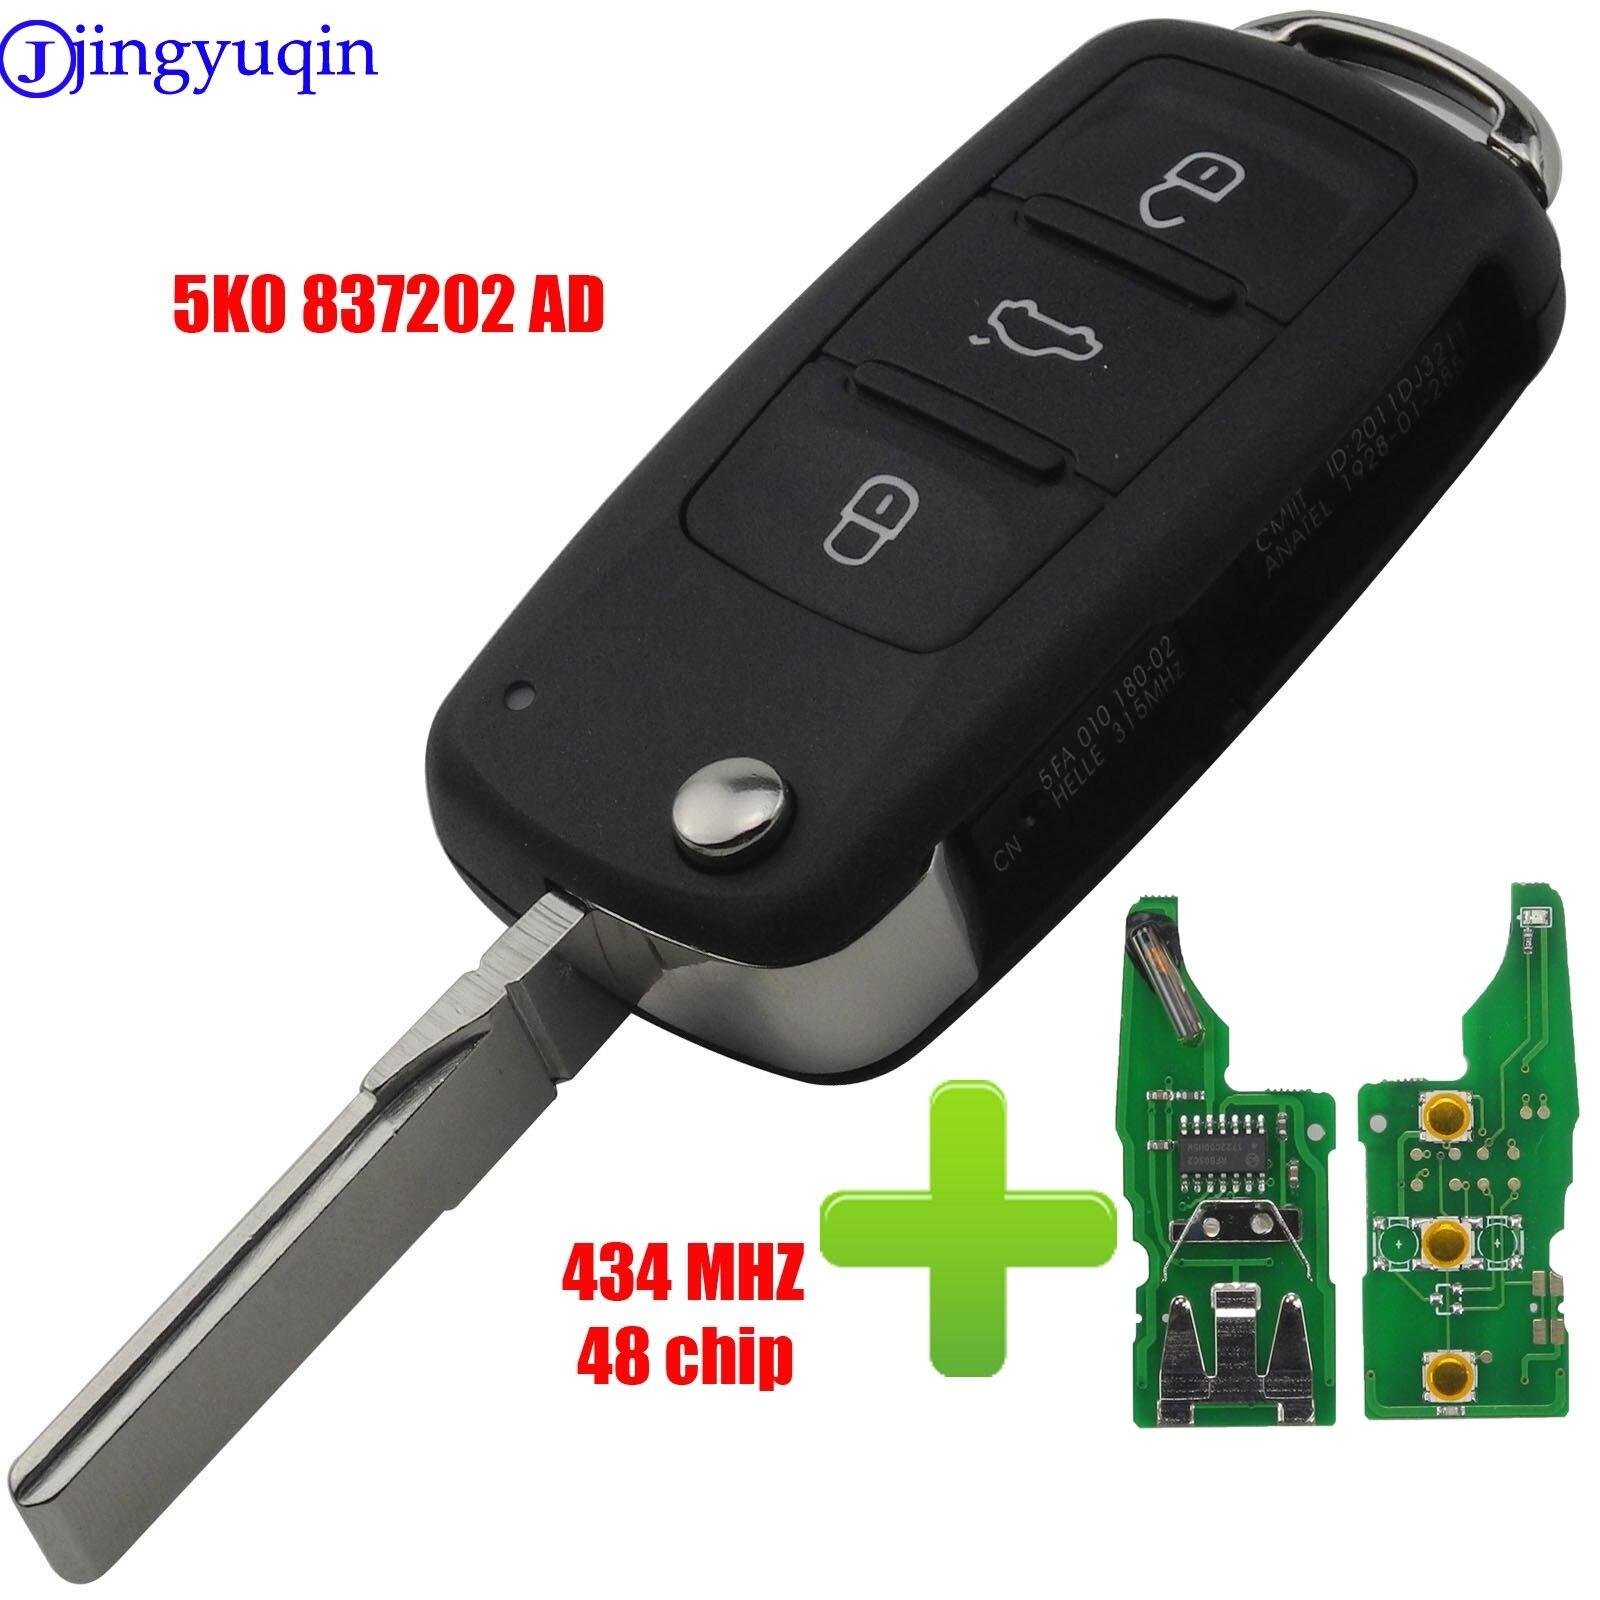 Пульт дистанционного ключа 434 МГц ID48 чип 5K0837202AD для VW Golf Tiguan Polo Passat CC SEAT Skoda Mk6 Octavia Jetta Beetle 3 BTN Flip